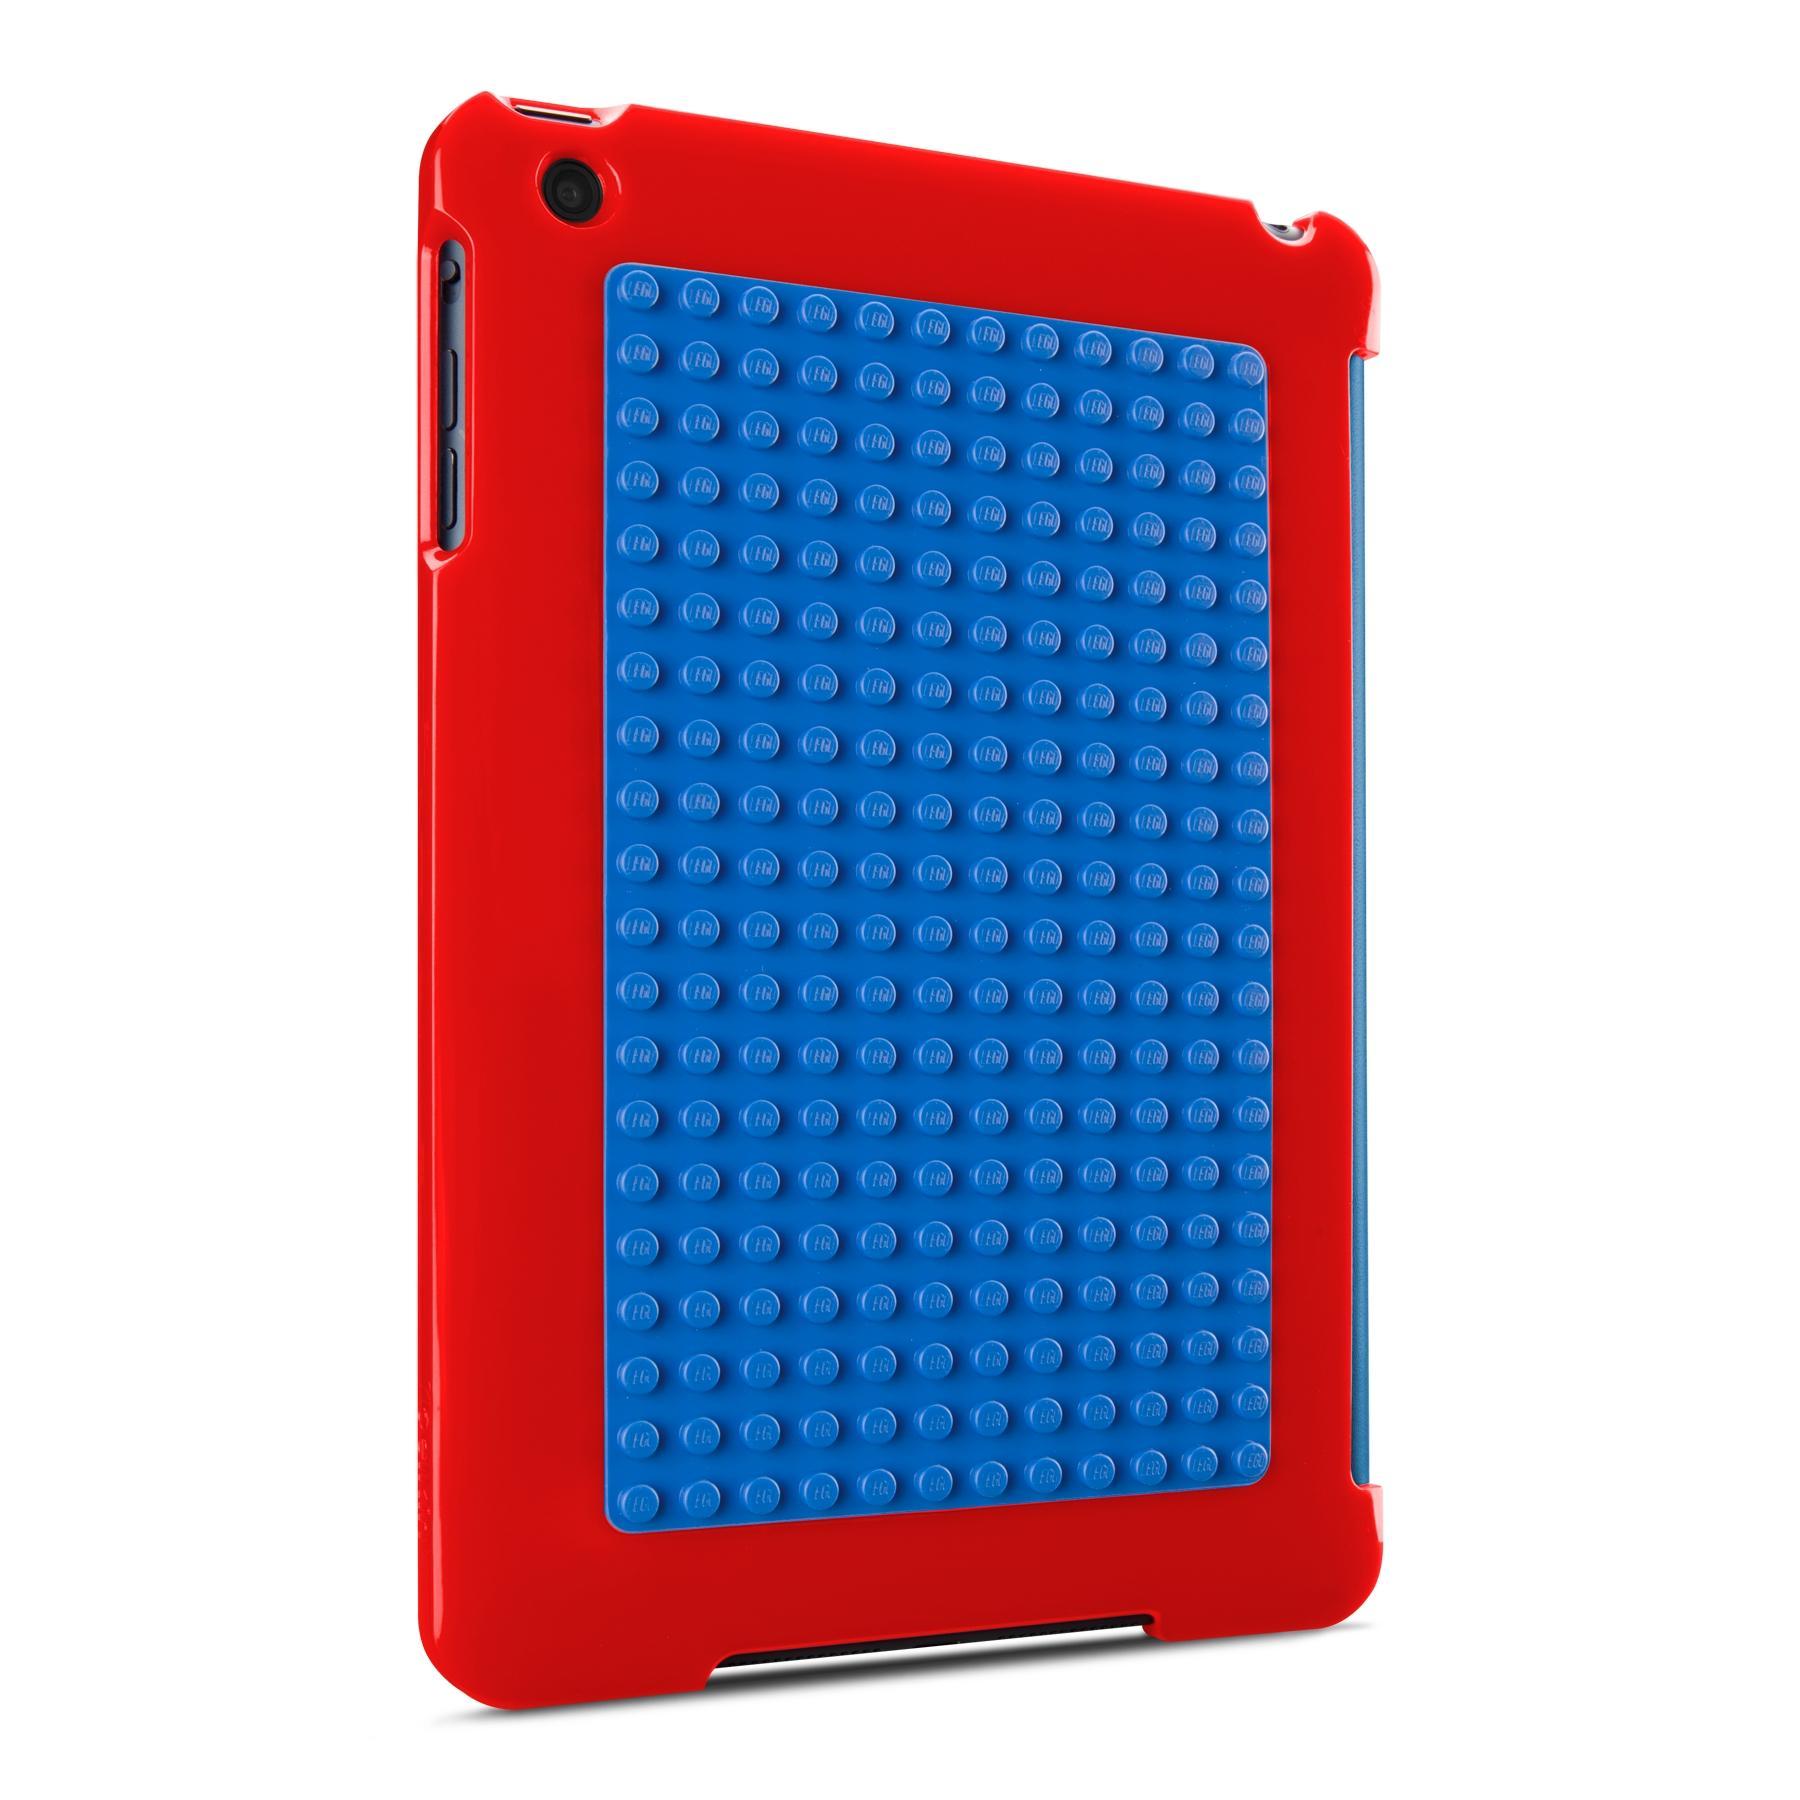 Belkin LEGO Builder Case For IPad Mini